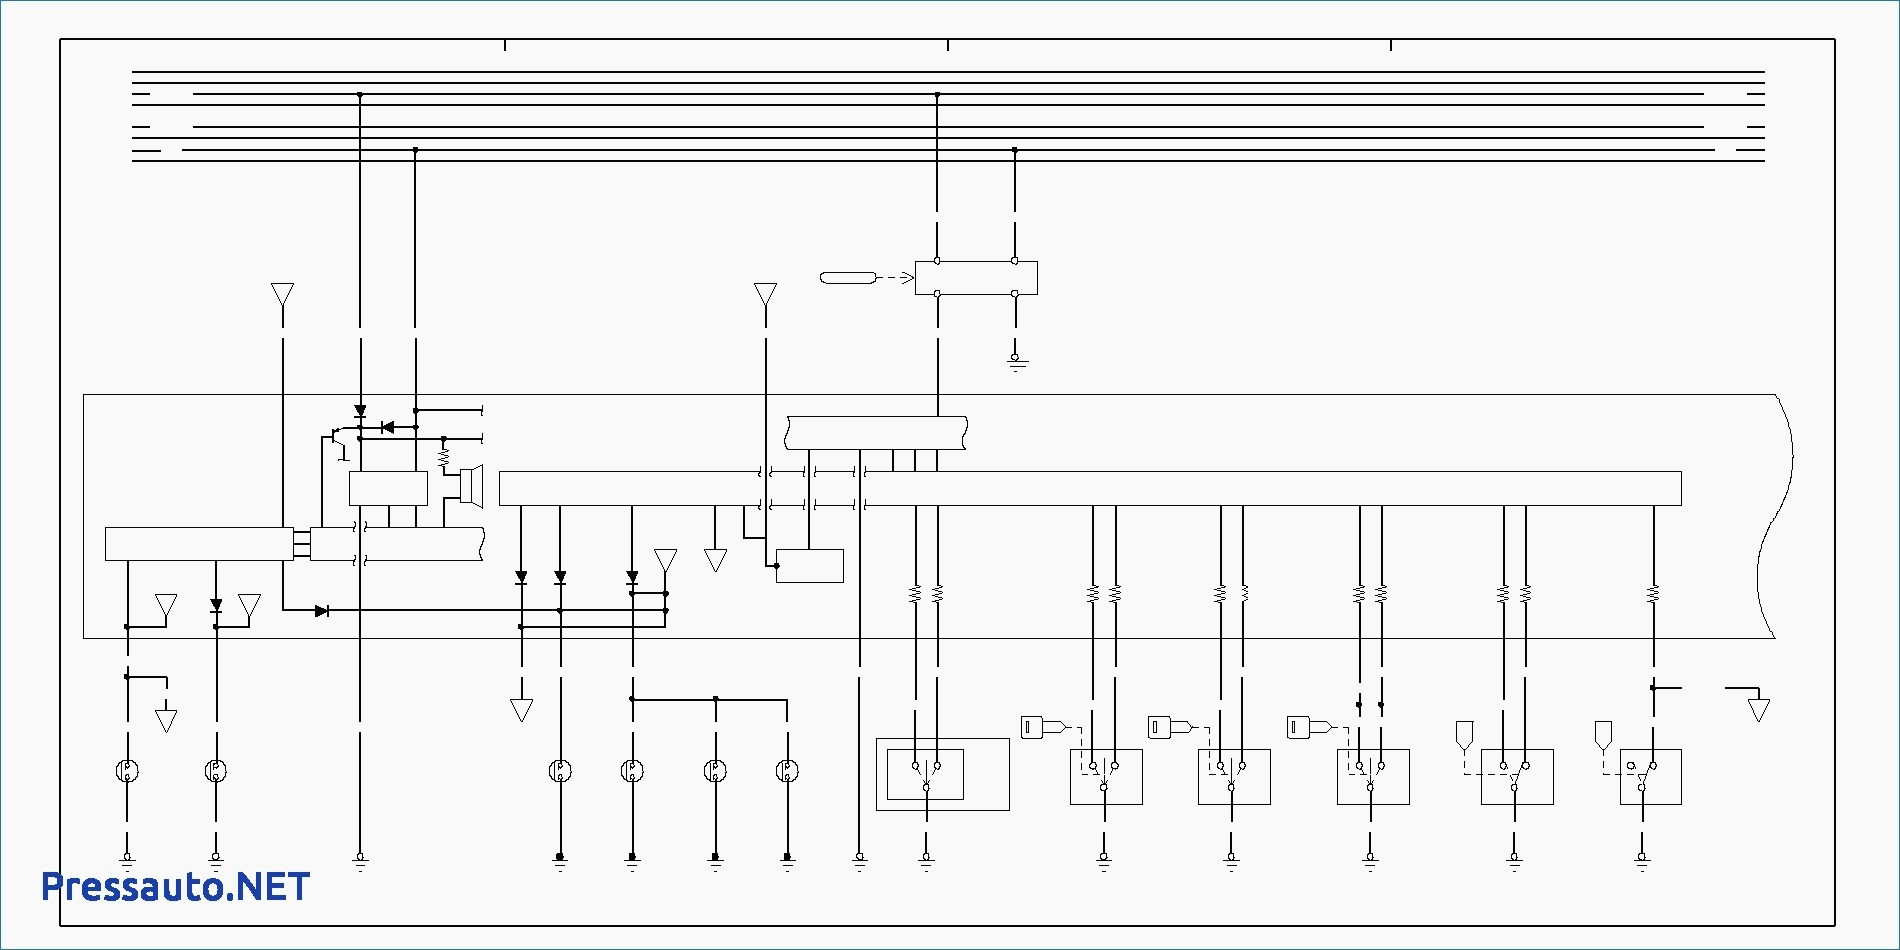 bbbind wiring diagram Collection Bbbind Wiring Diagram 14 t